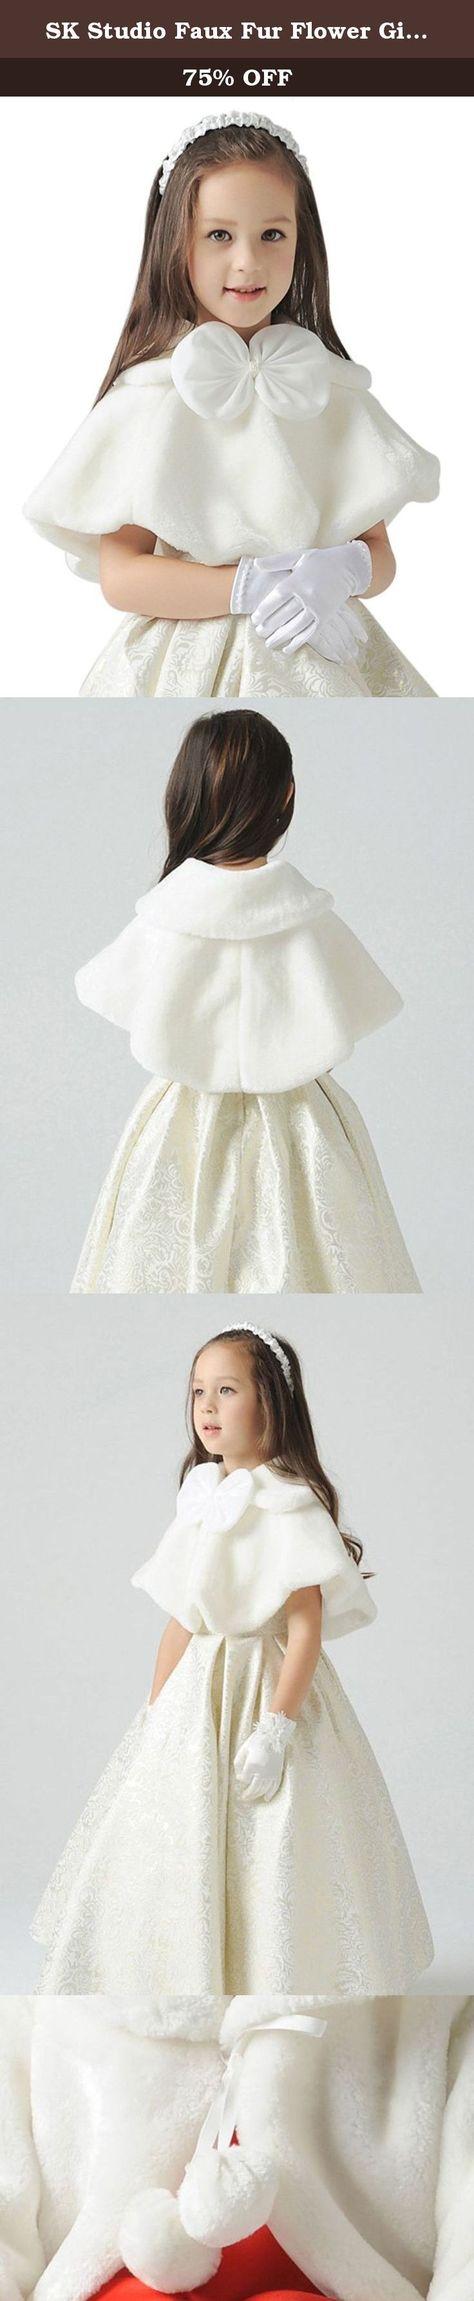 SK Studio Flower Girl Faux Fur Stole Shawl Wraps Cape Kids